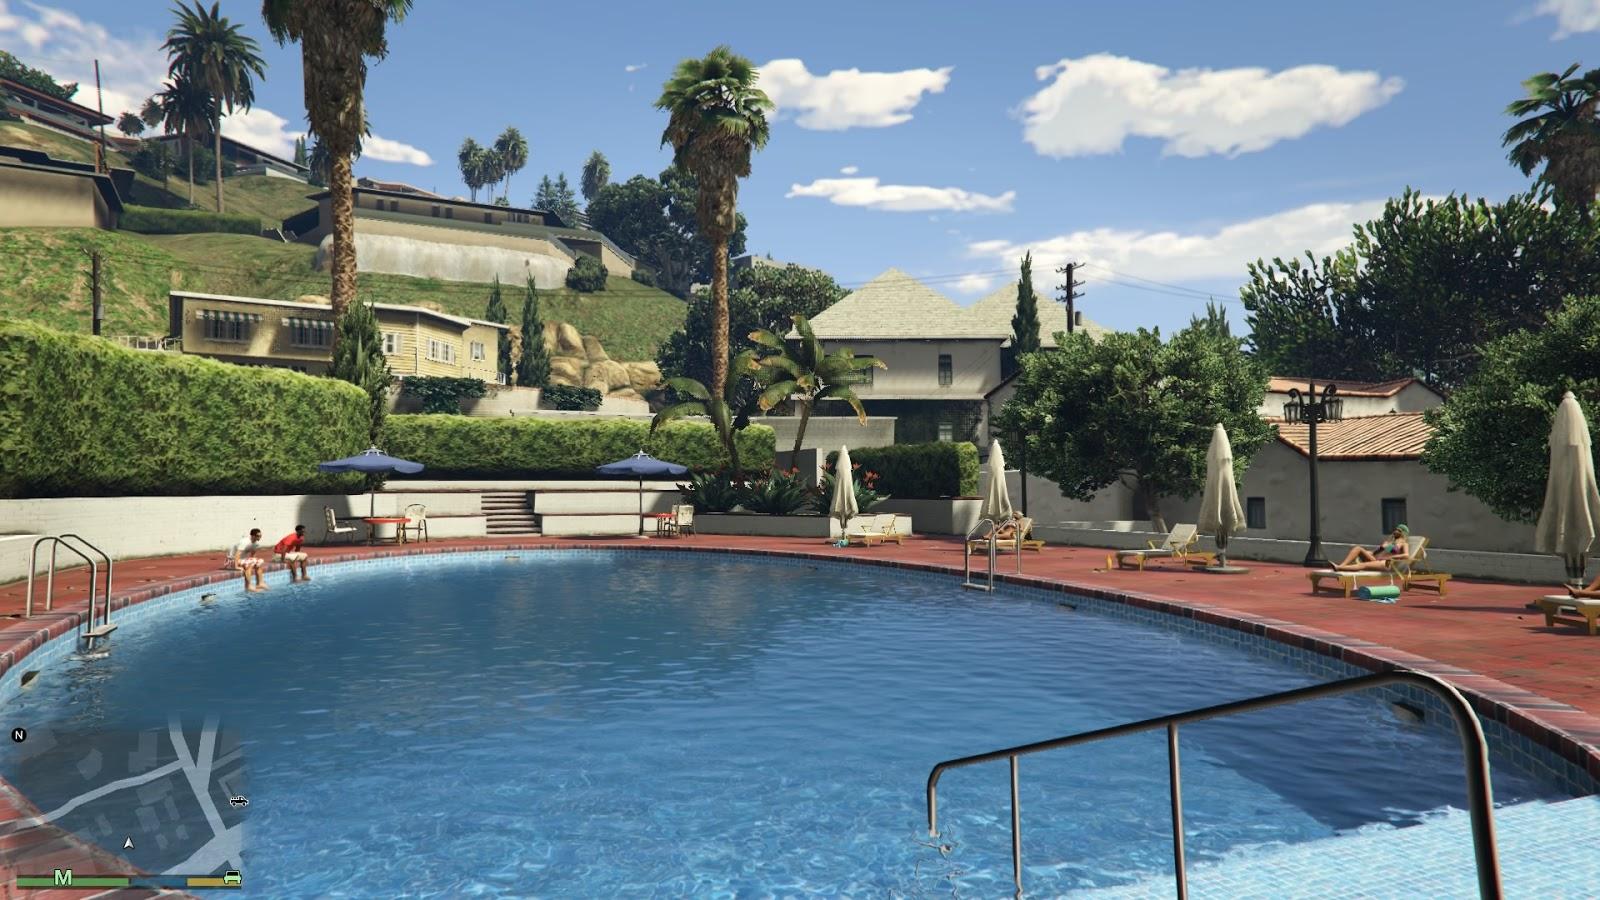 GTA Grand Theft Auto Vice city Game - Hellopcgames